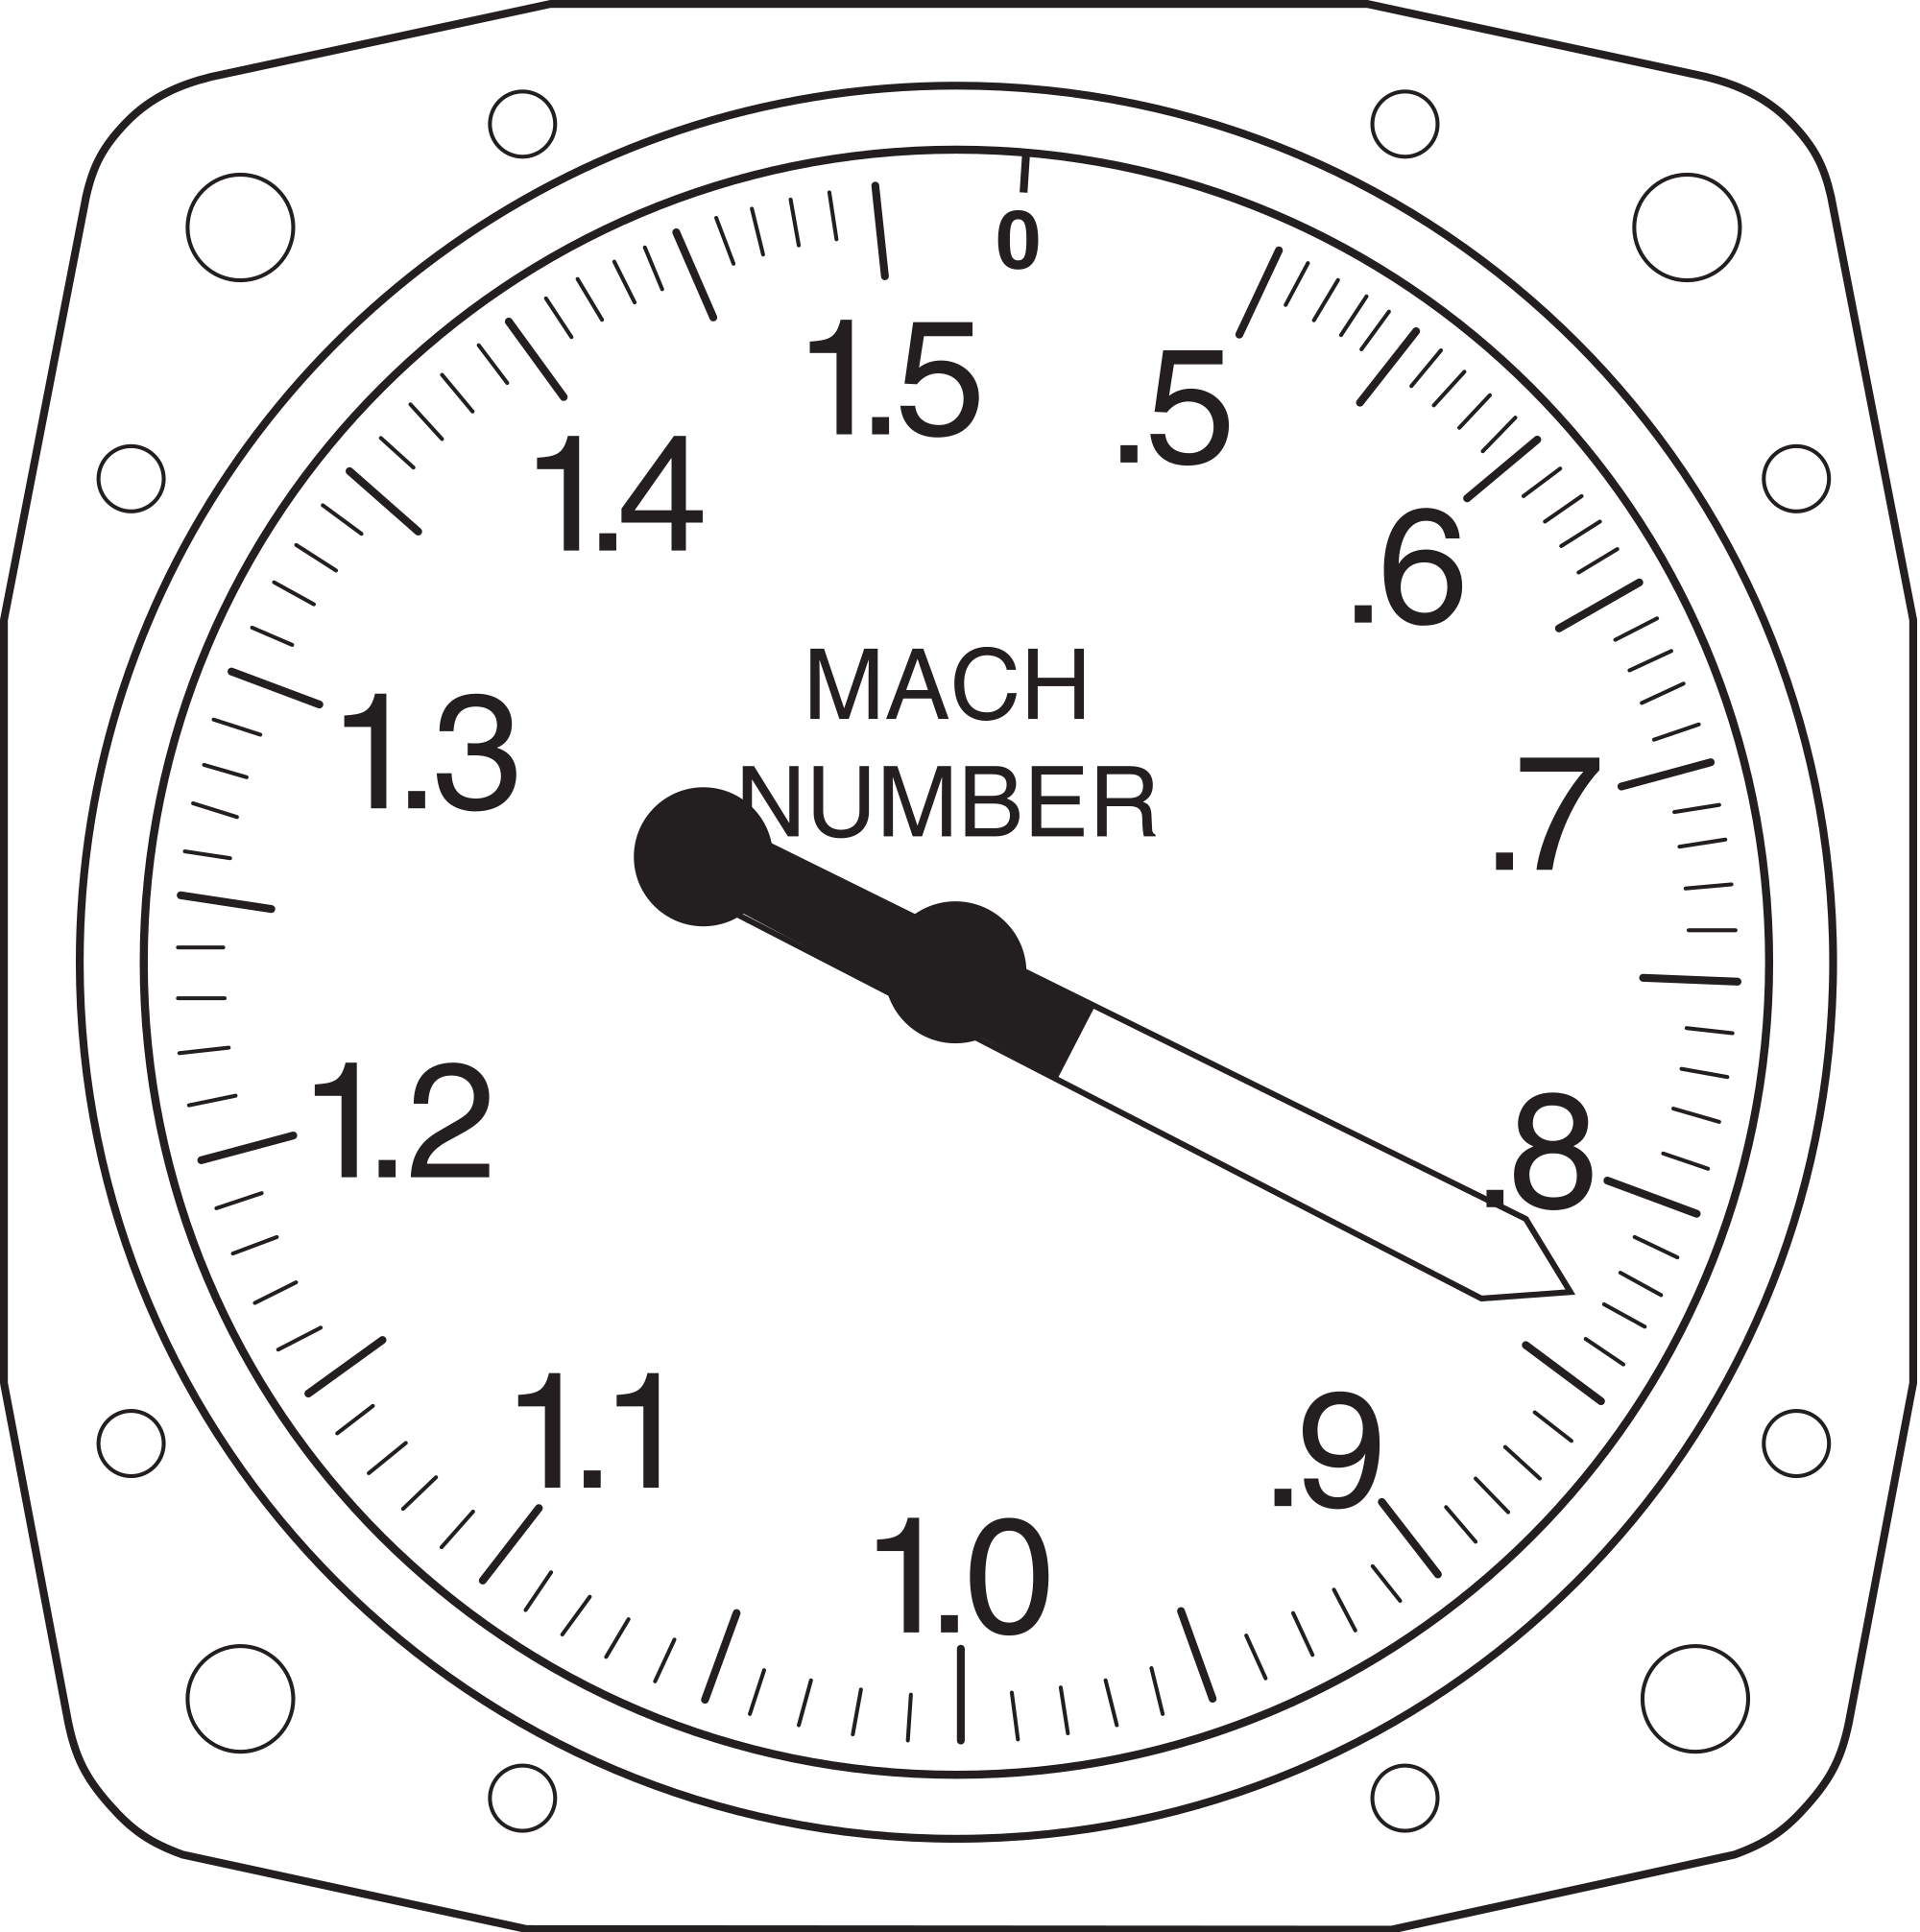 2000x2013 Filemachmeter.svg